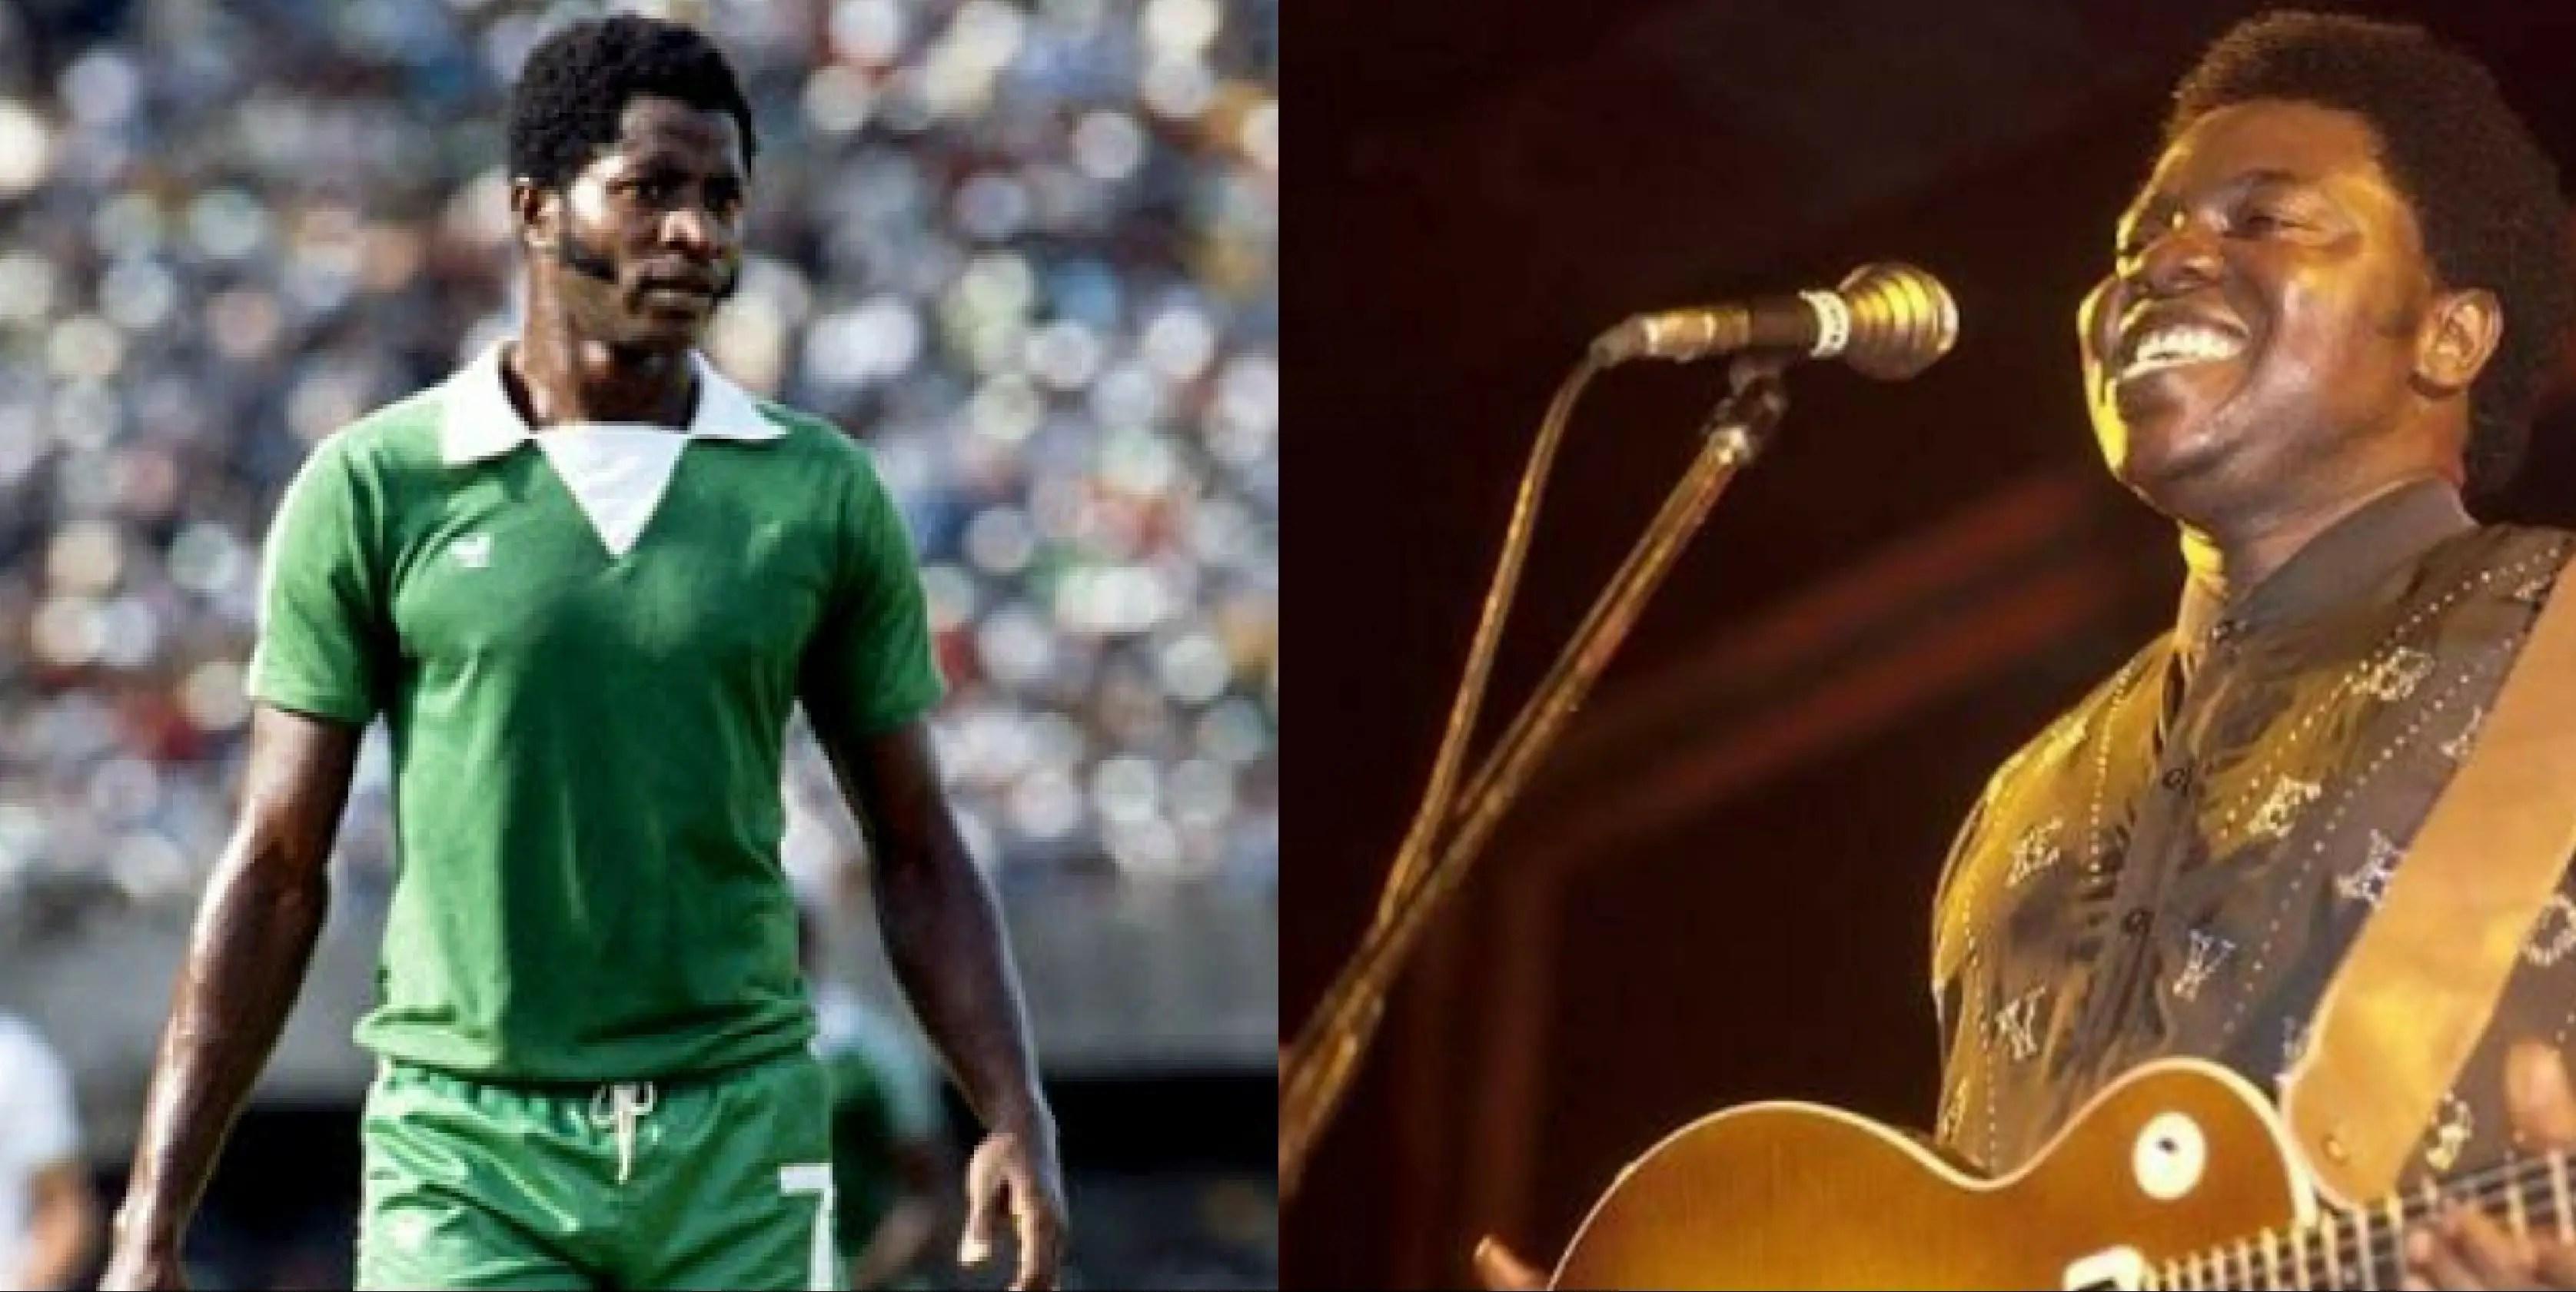 Odegbami: At Last, I Meet My Greatest Fan!